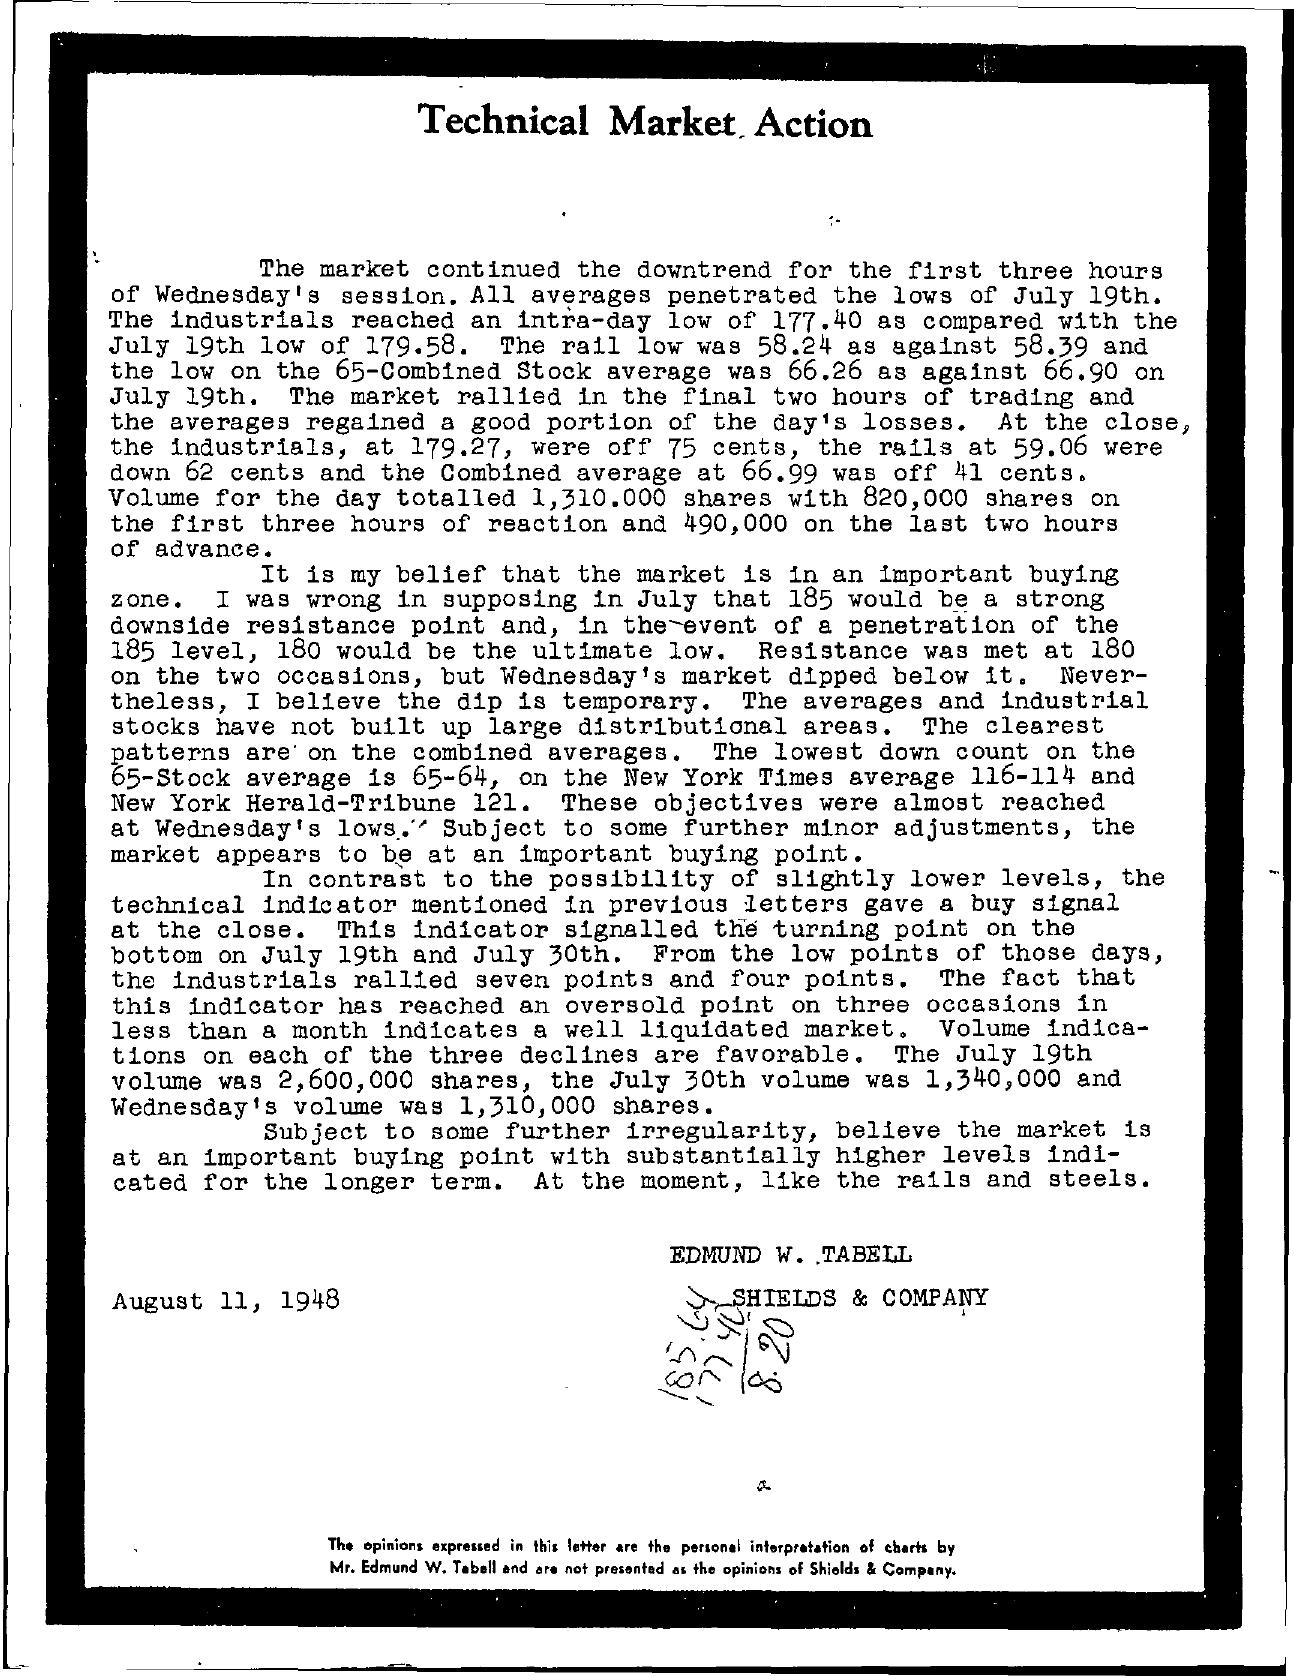 Tabell's Market Letter - August 11, 1948